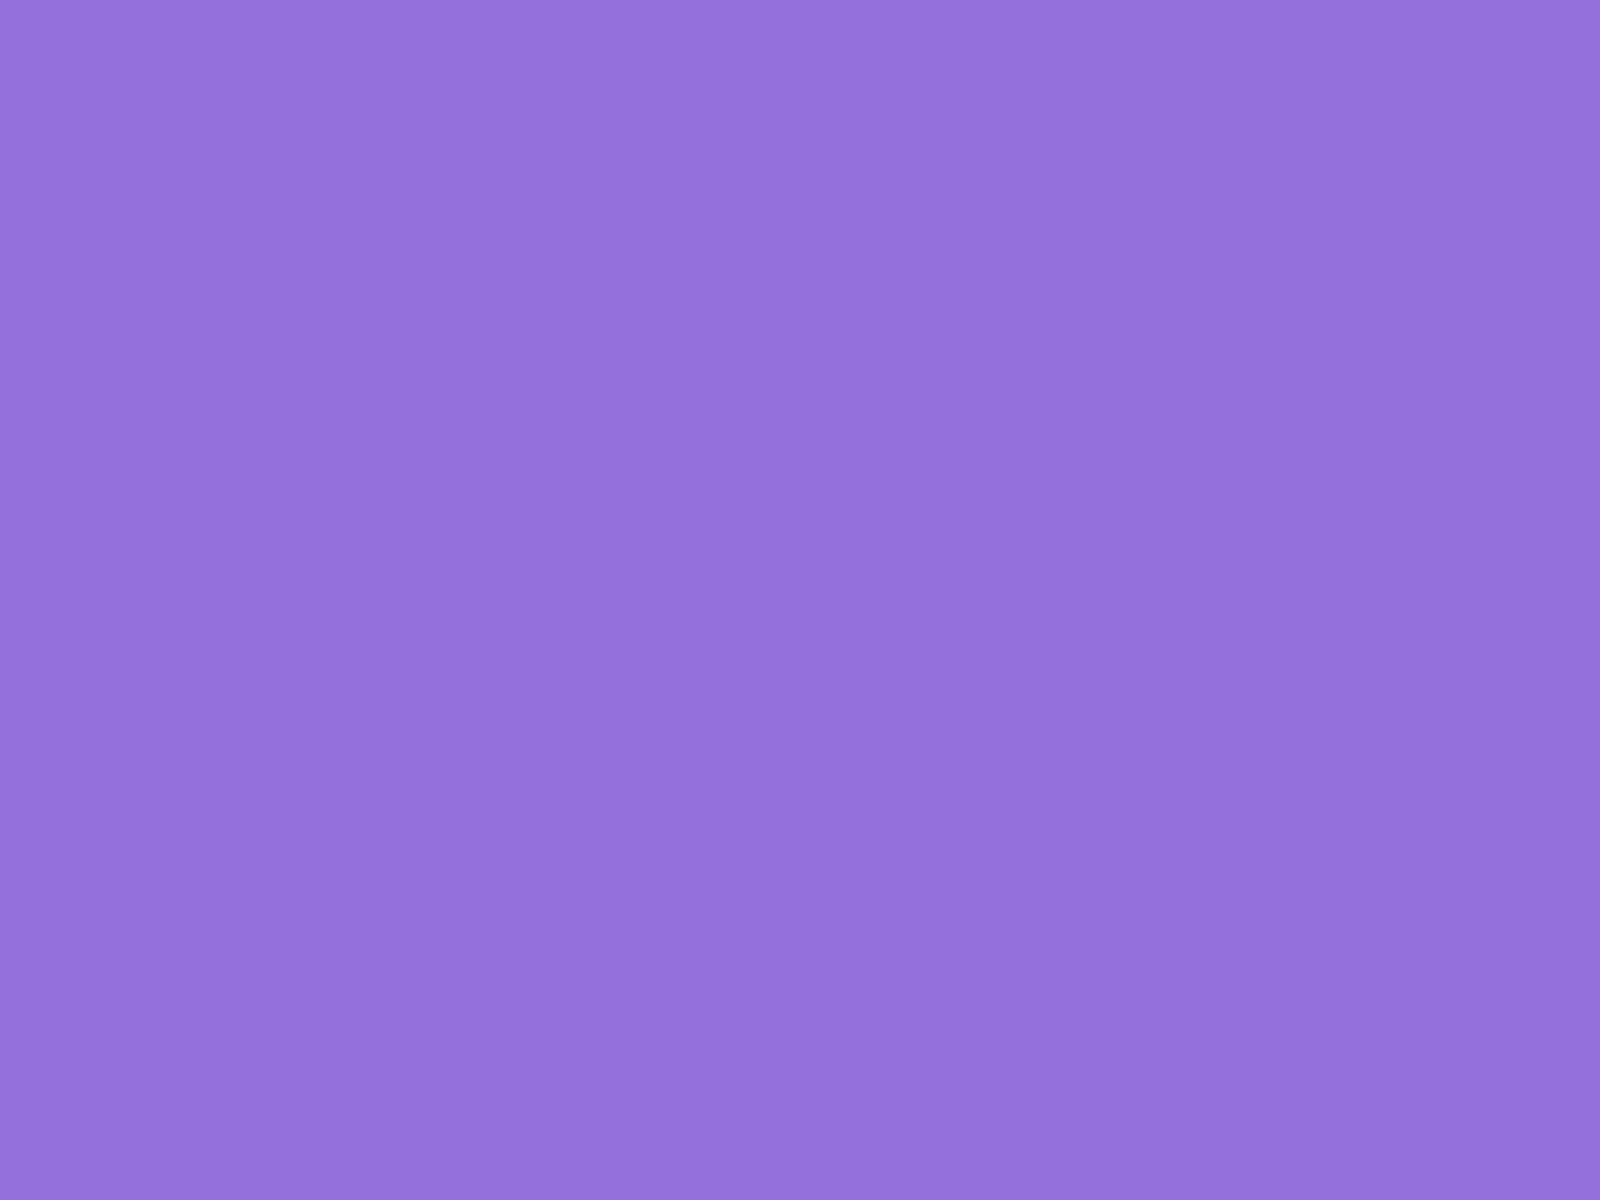 1600x1200 Medium Purple Solid Color Background